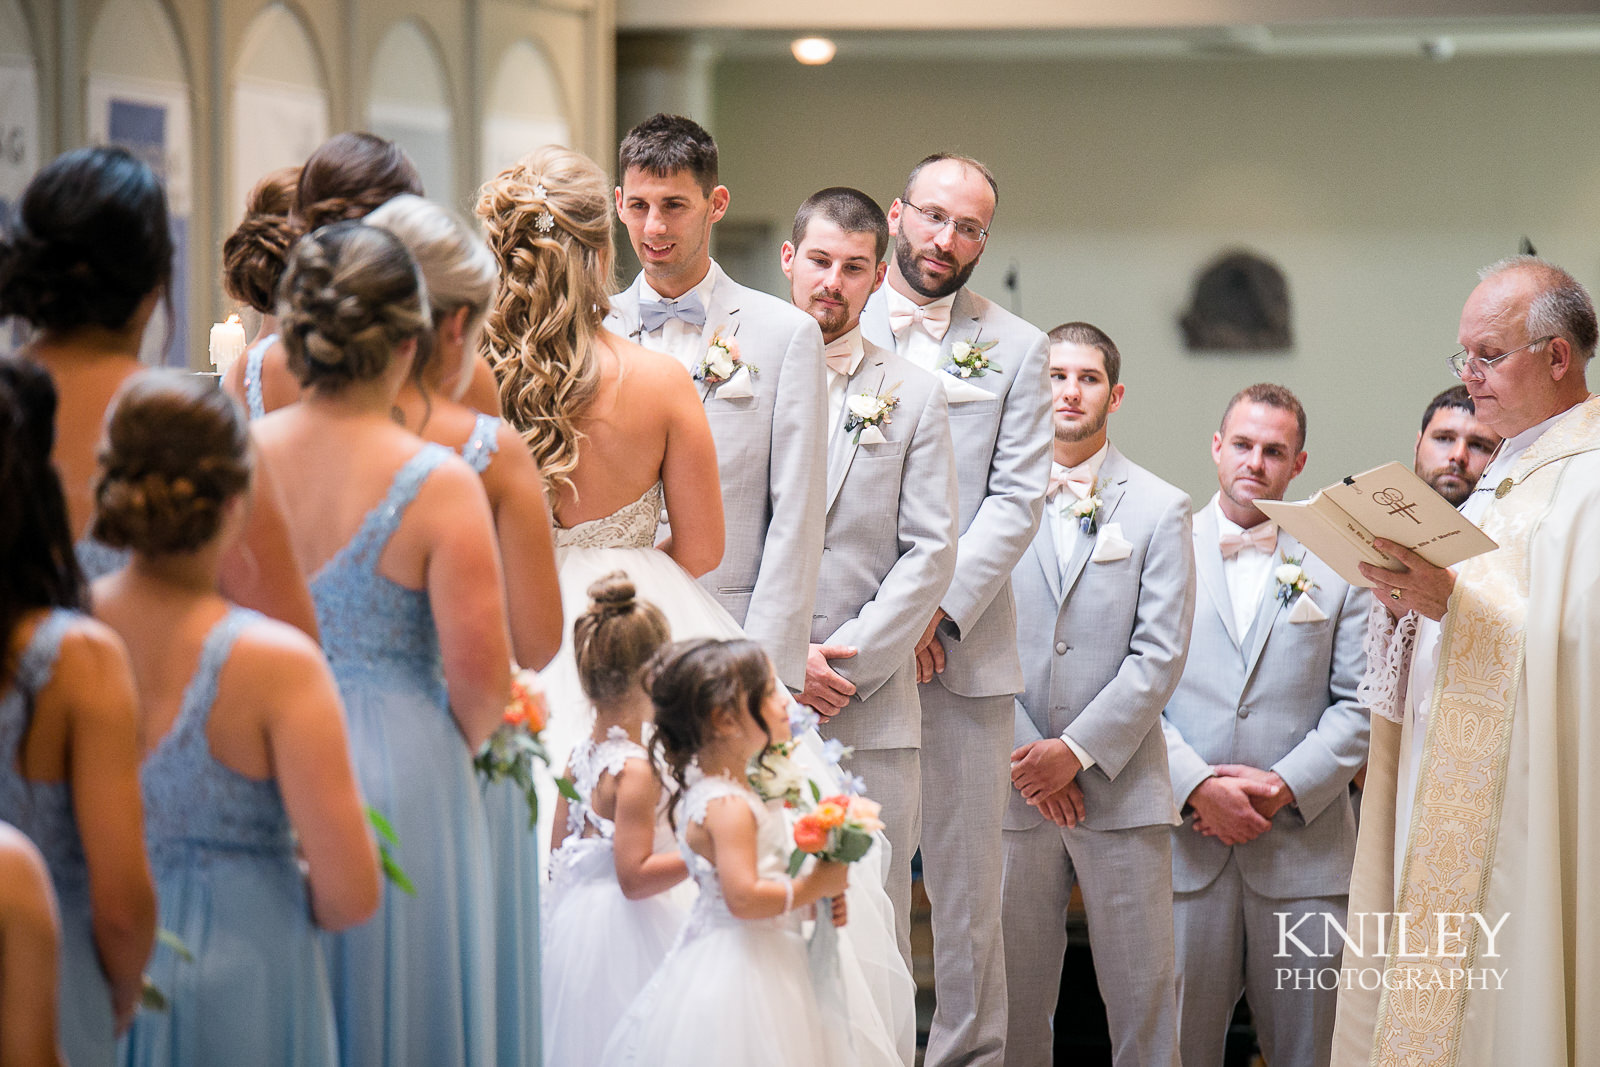 055 - Buffalo NY wedding pictures - St Marys Church - IMG_7942.jpg